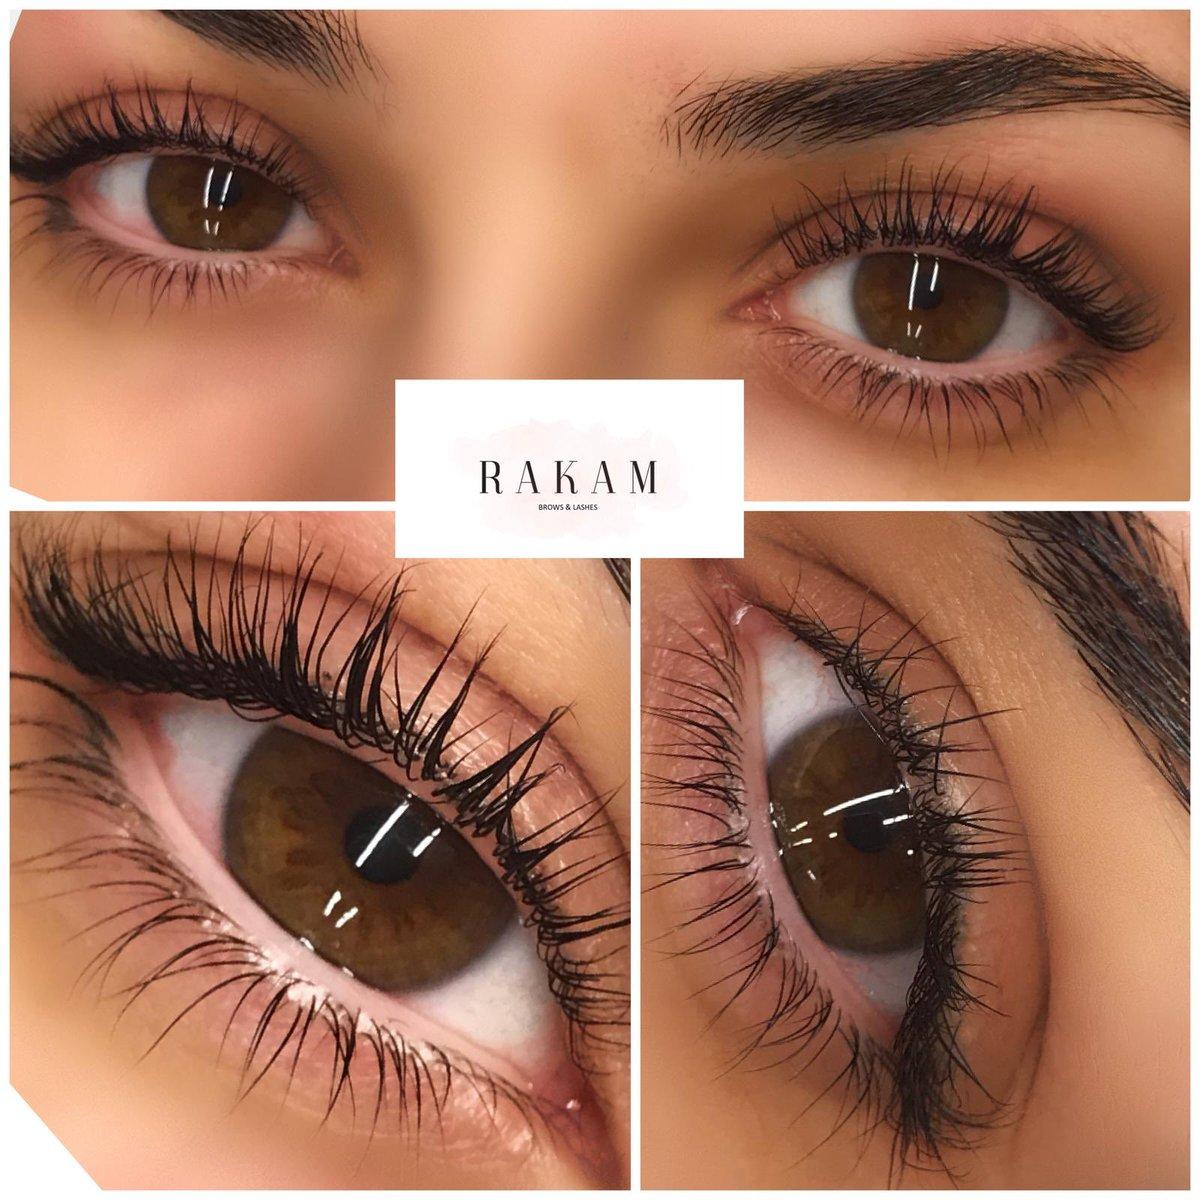 3bef4b4ed59 R A K A M Brows & Lashes - London · @RakamBrows. 8 days ago. Check out the  amazing before & after photos #lashlift Only at @RakamBrows #eyelashlift